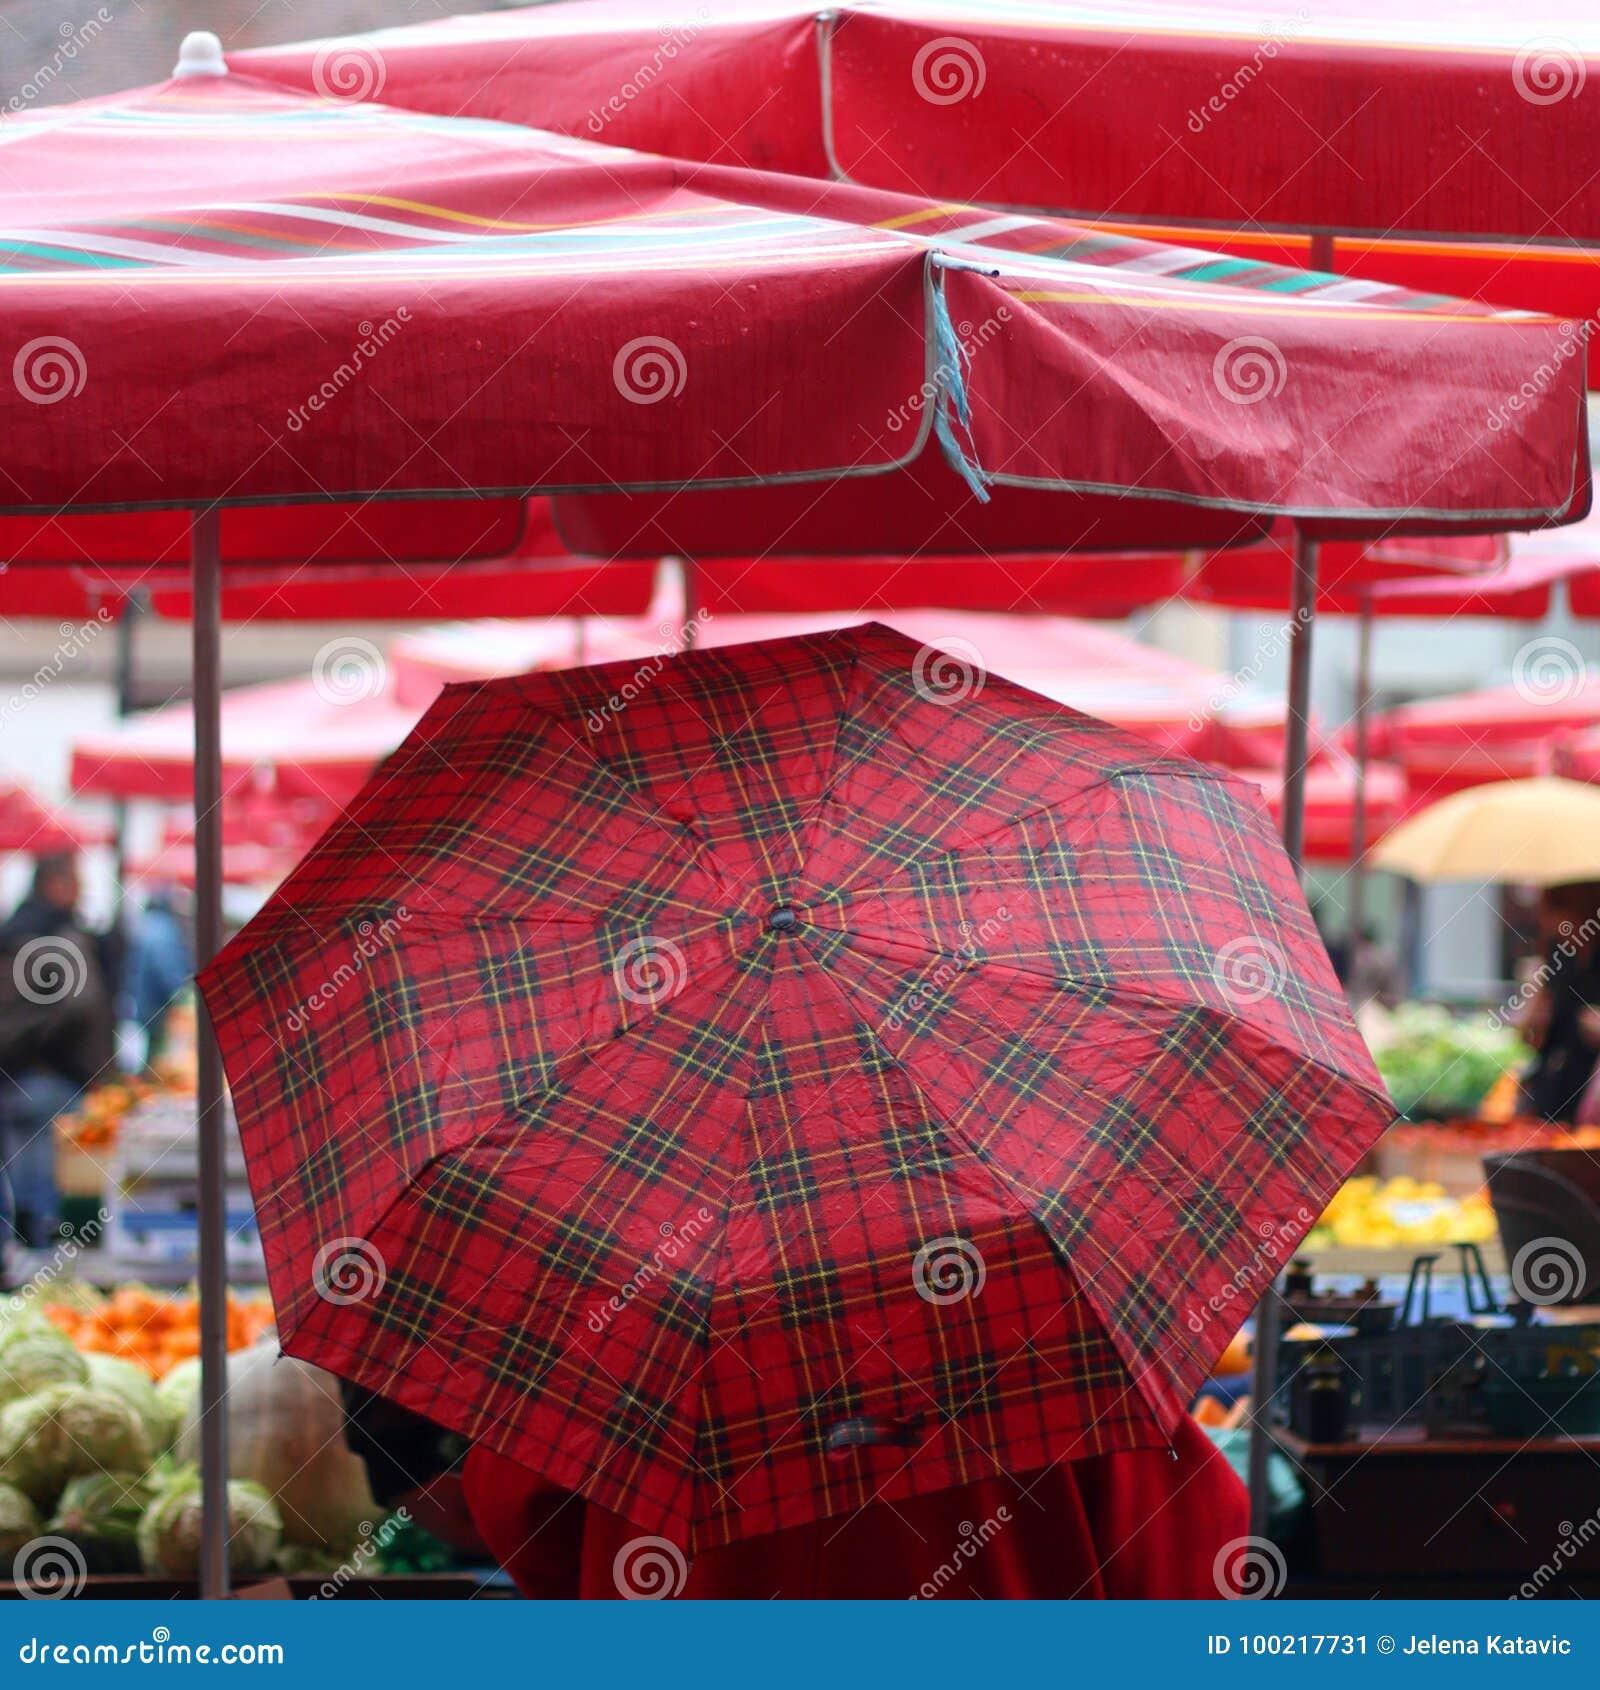 Dolac市场,萨格勒布